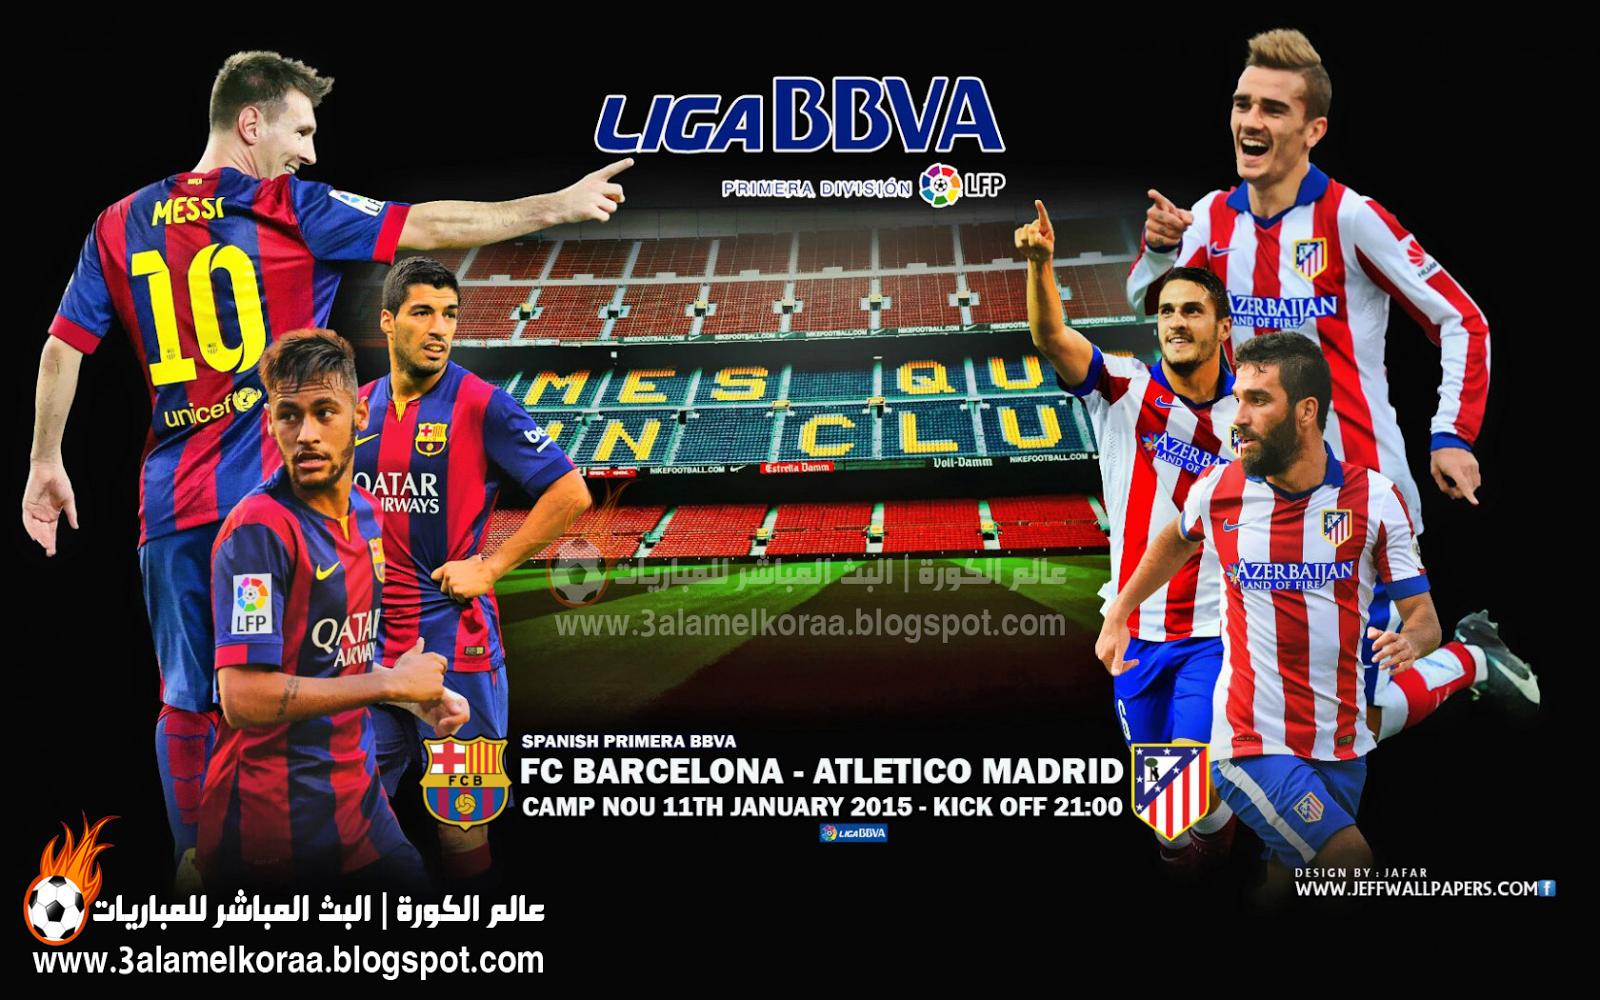 fussball live real madrid vs barcelona